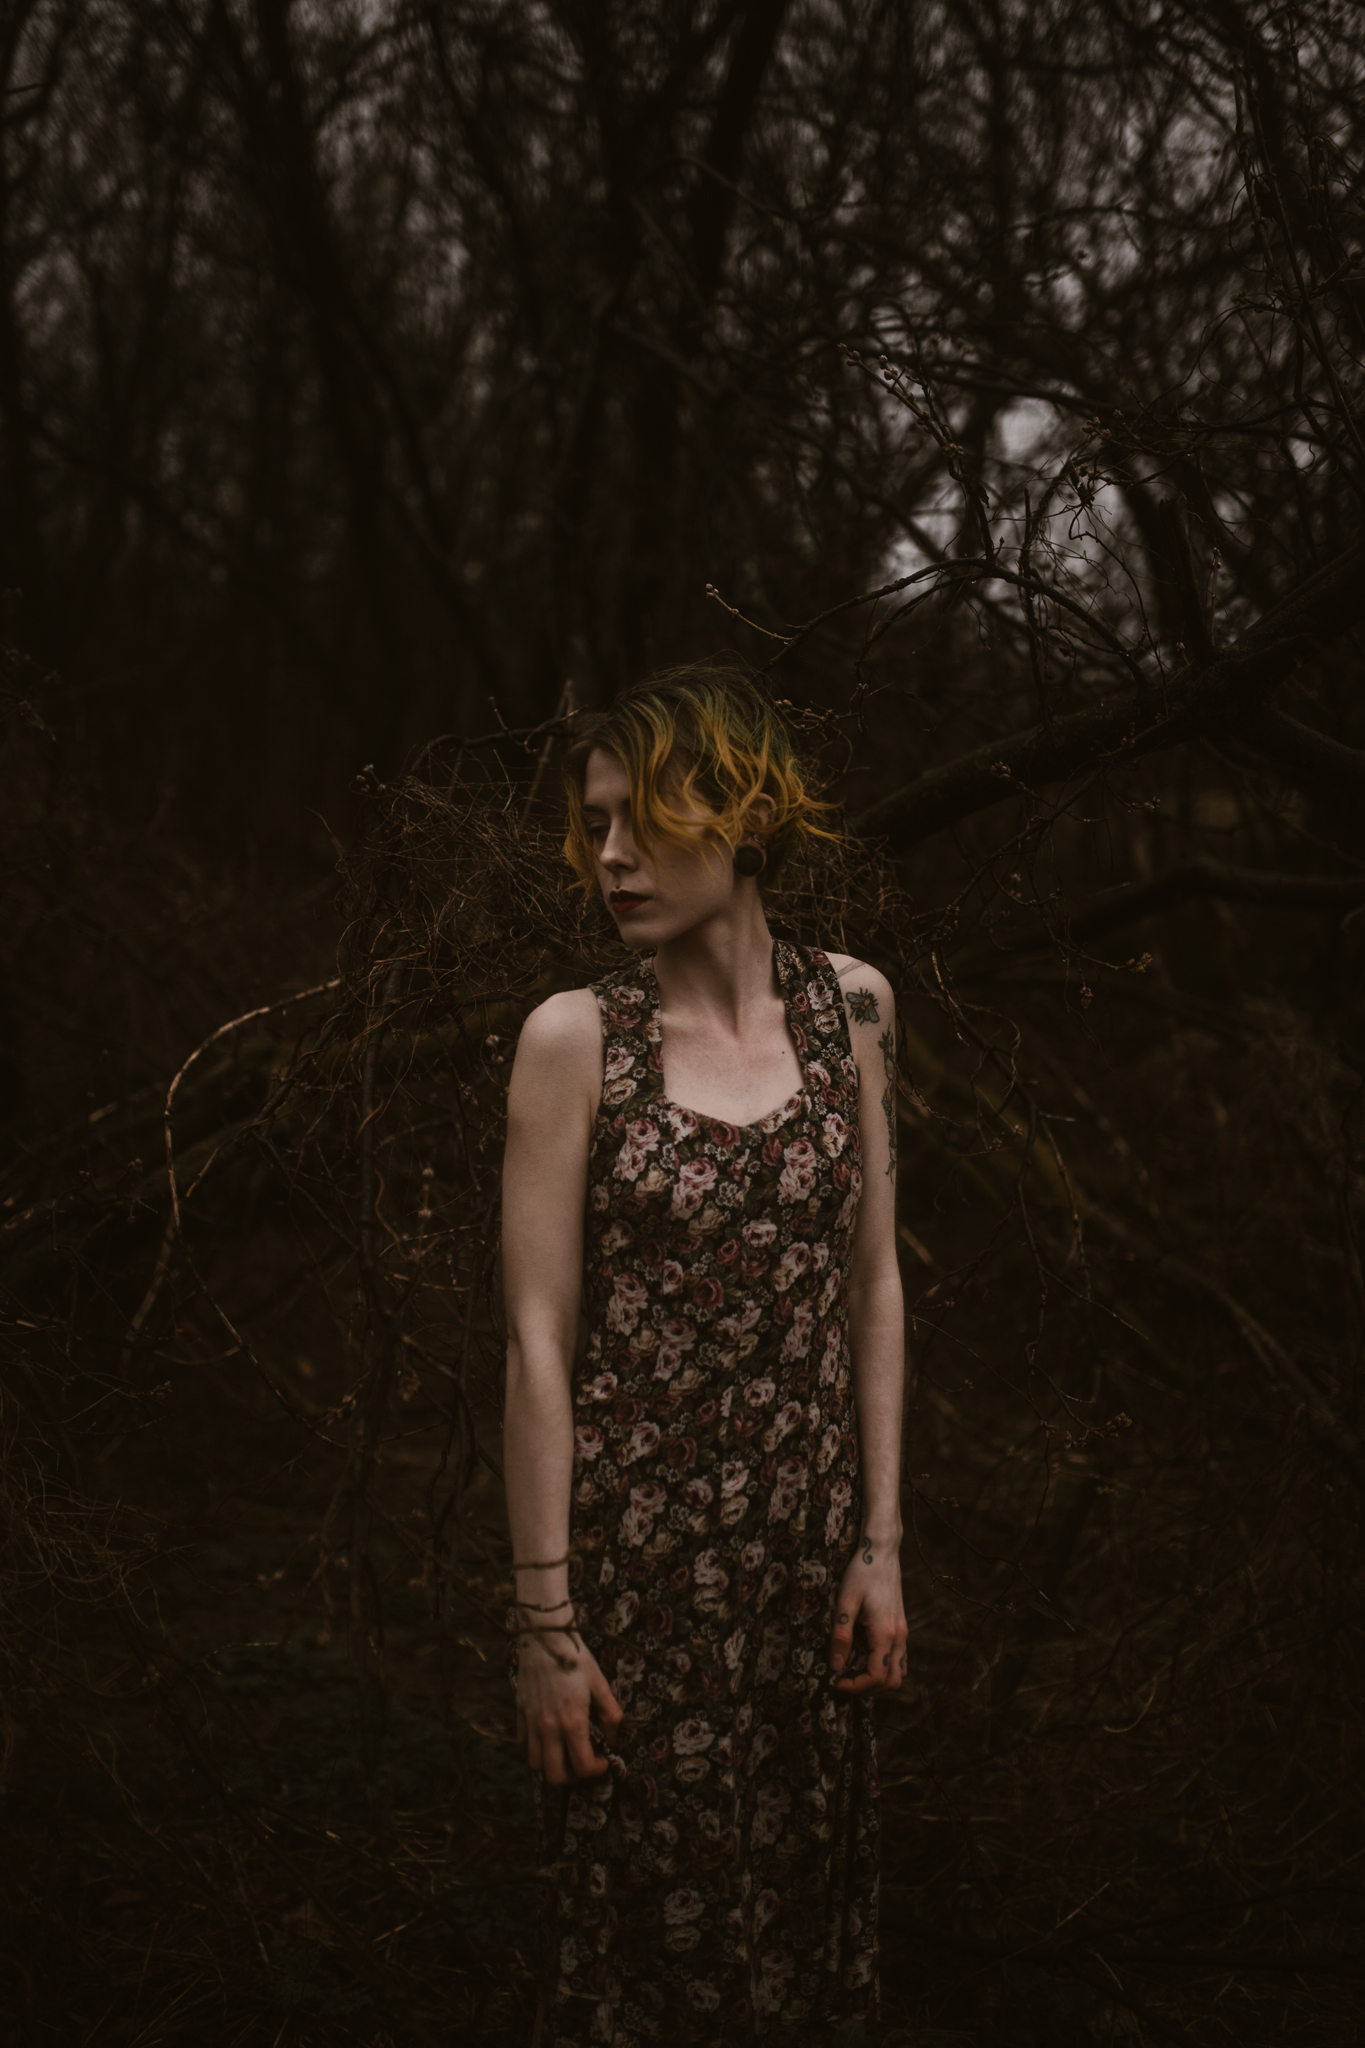 Jess-rioux-2017-132fb.jpg